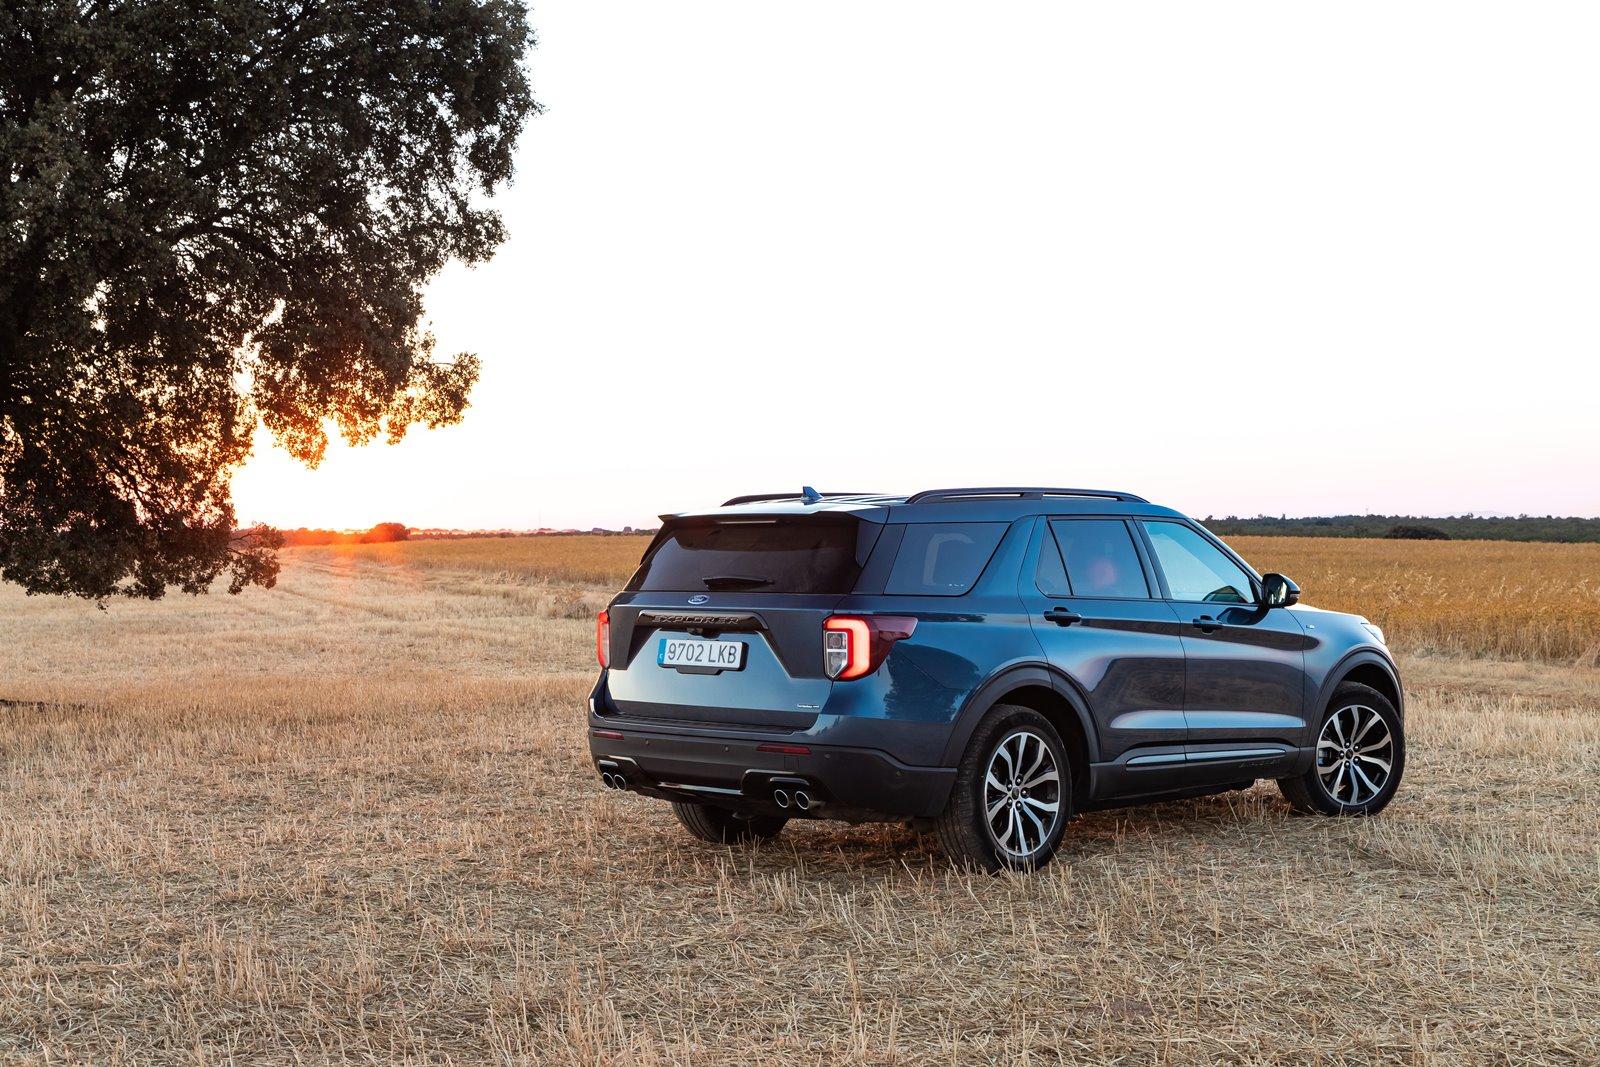 Nos ponemos al volante del Ford Explorer 3.0 PHEV AWD